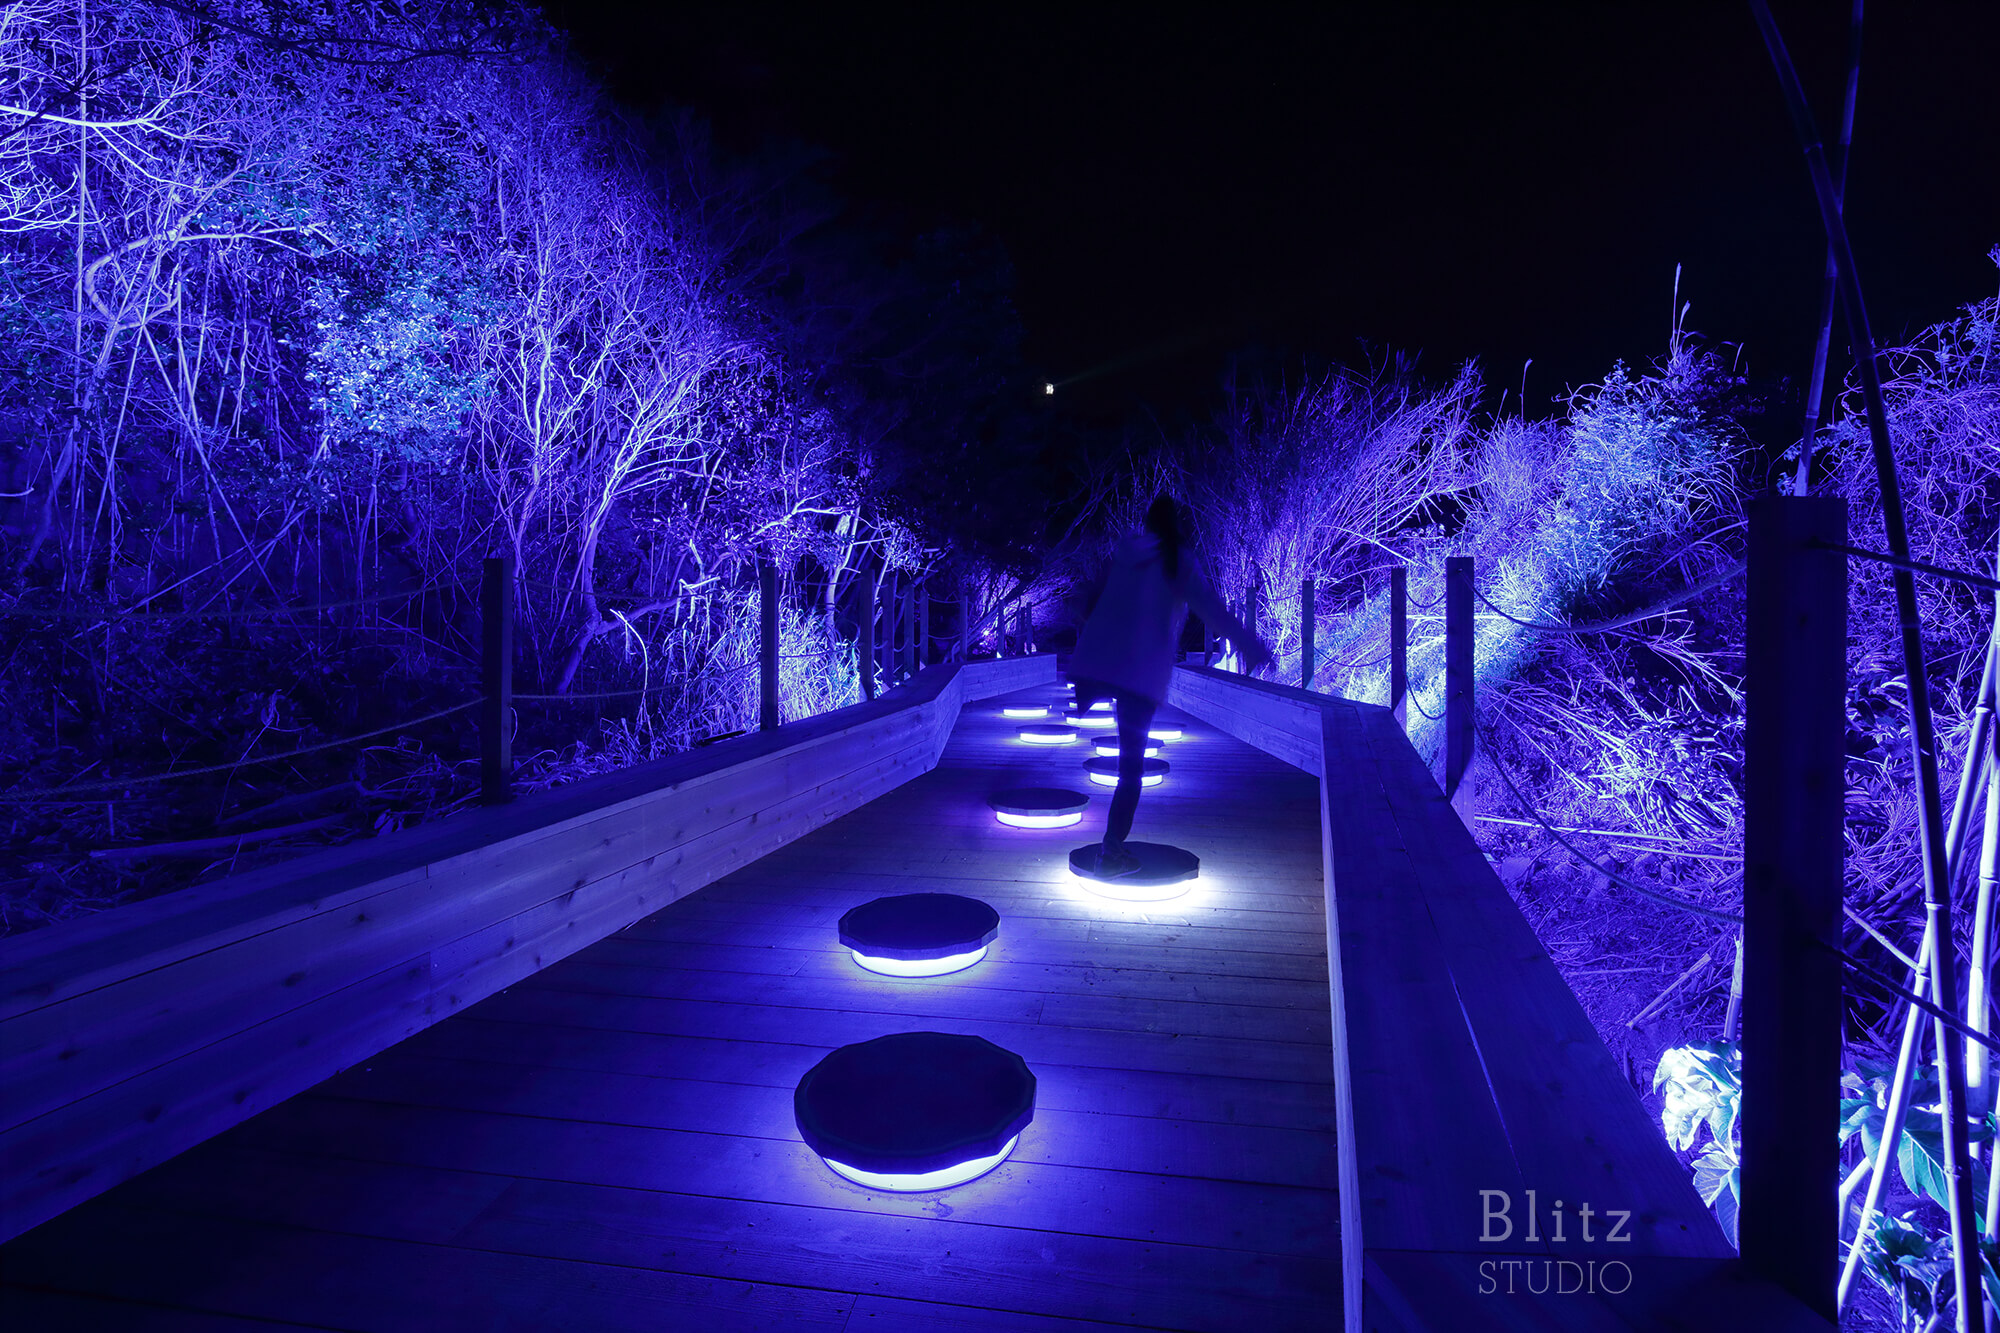 『ISLAND LUMINA 自然を舞台にしたマルチメディア・ナイトウォーク』-i+Land nagasaki 長崎県・伊王島-建築写真・竣工写真・インテリア写真4